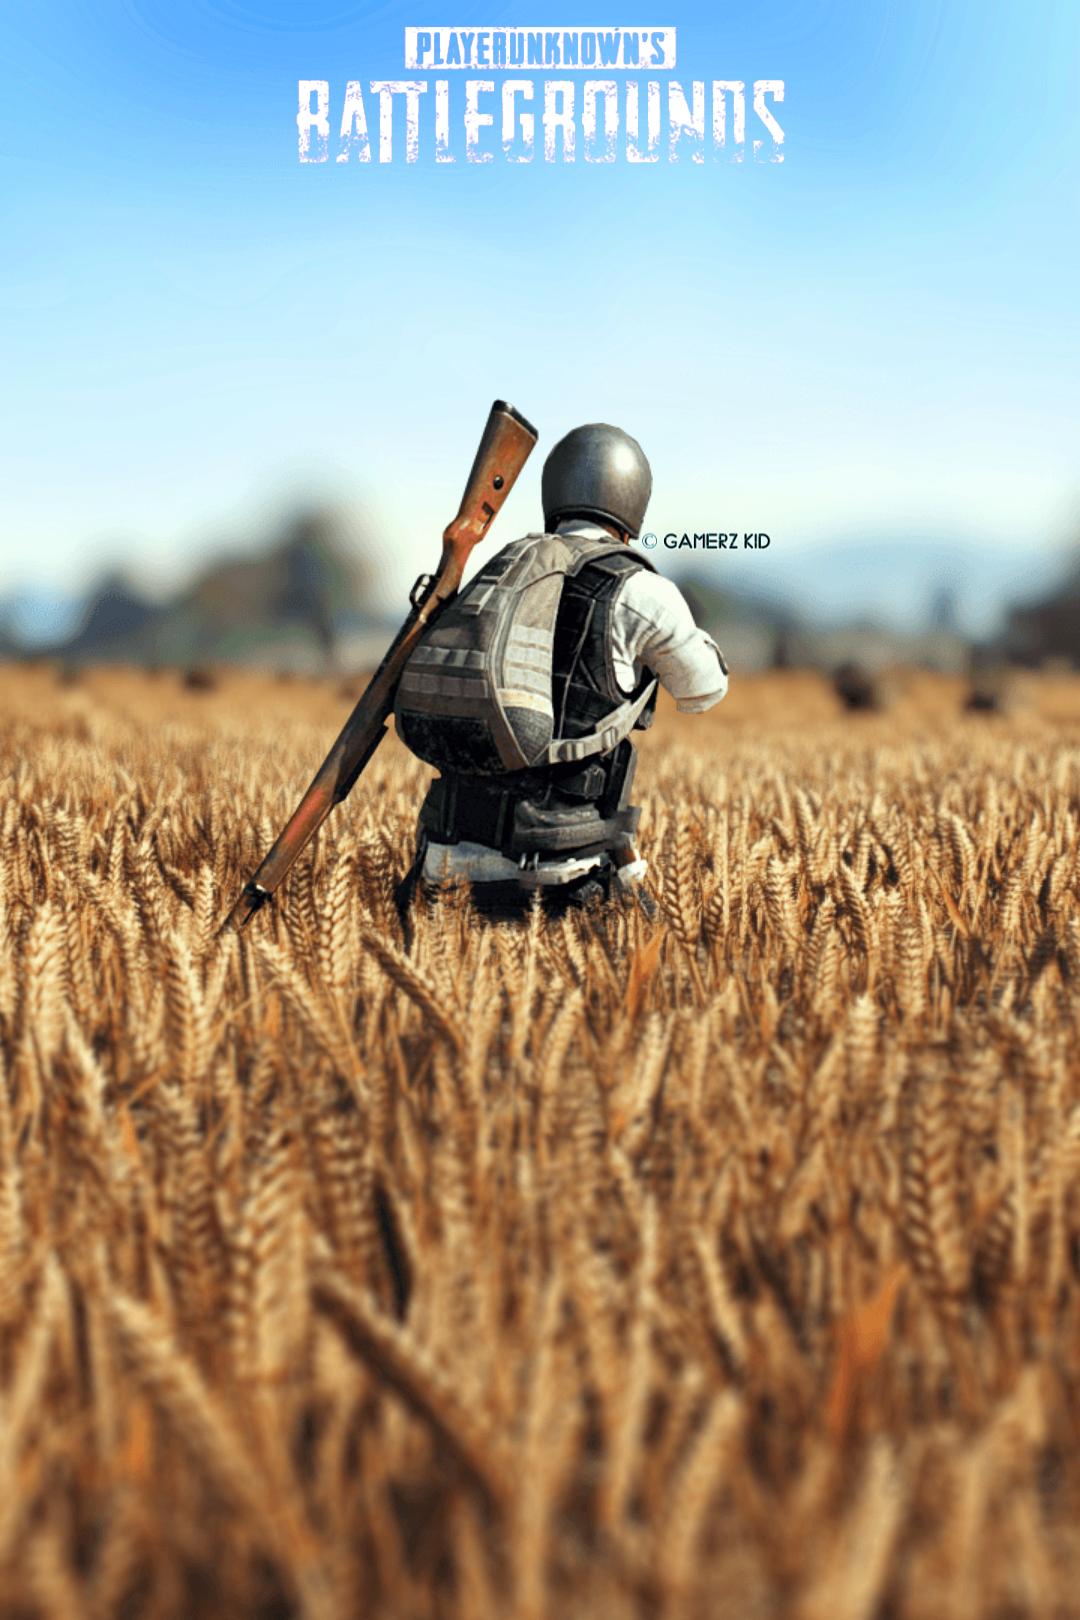 Playerunknown S Battlegrounds Pubg Blogs At Gamezkid Com In 2020 4k Wallpaper For Mobile Ios Wallpapers Guns Wallpaper